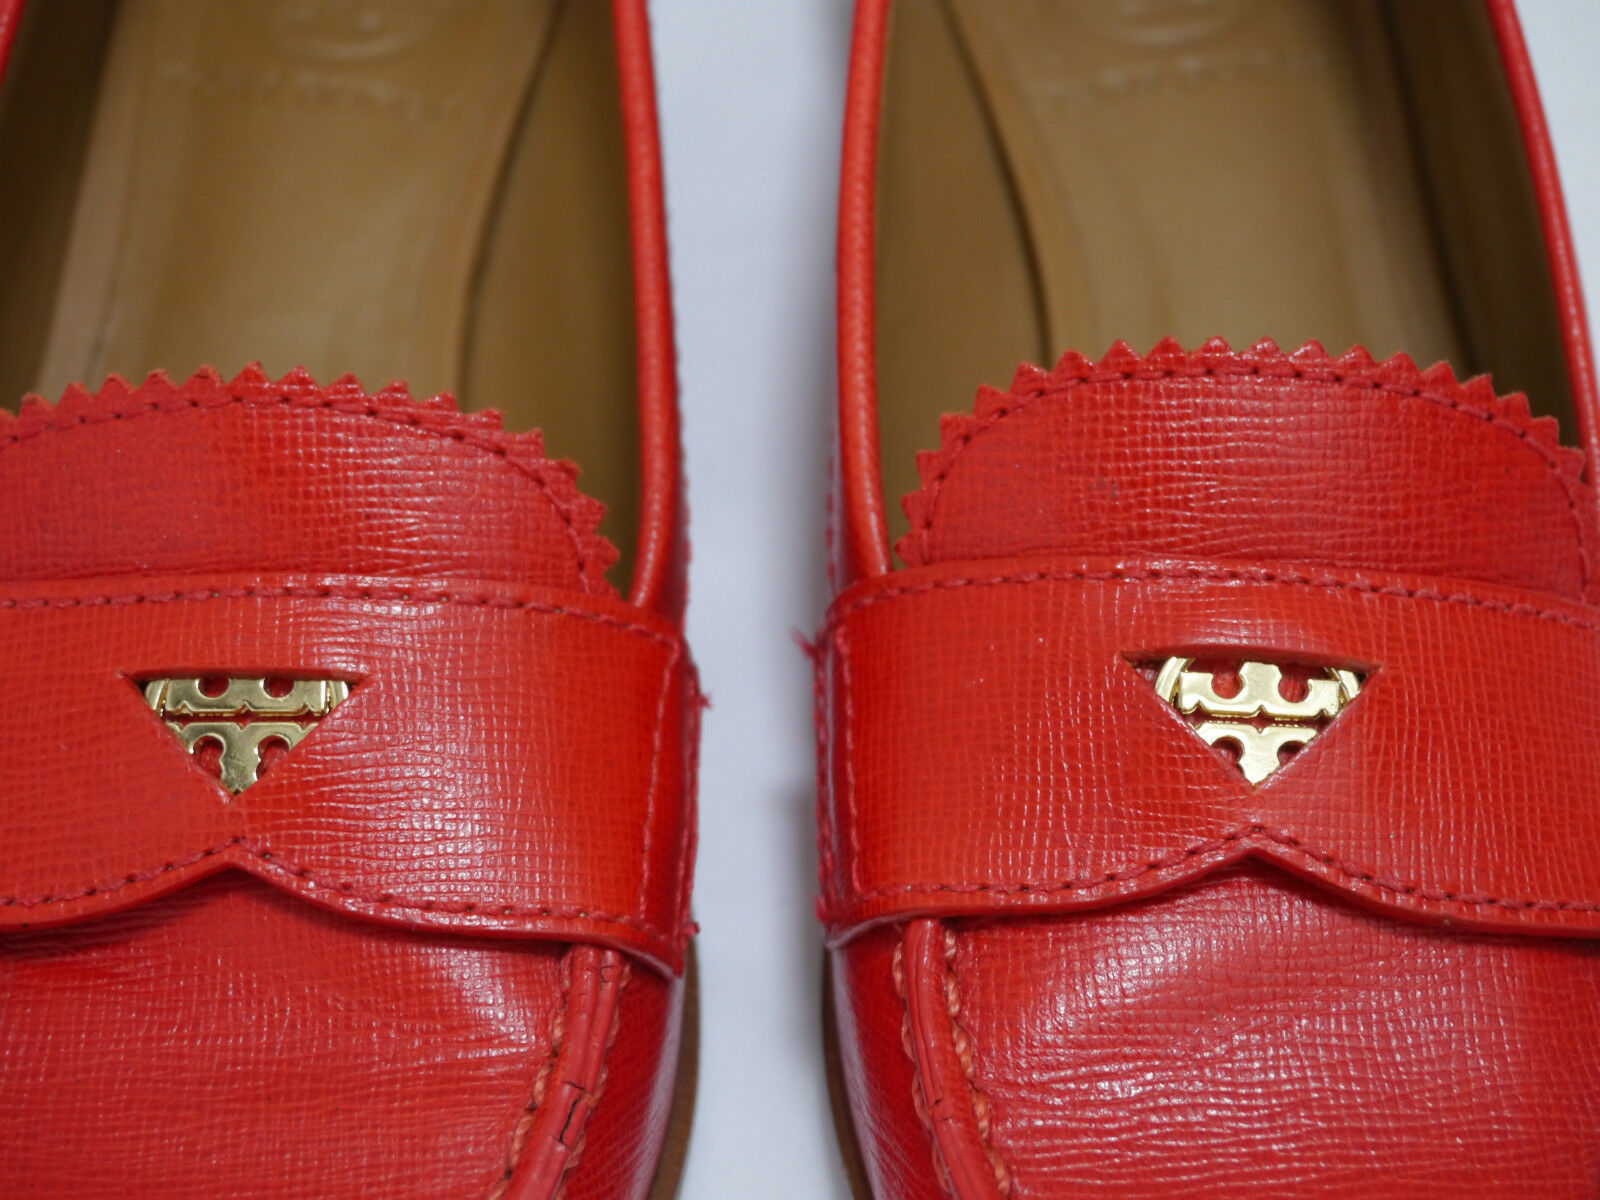 TORY BURCH 250 saffiano Pennie Penny Loafer ROT saffiano 250 Leder schuhe Größe 5.5 9f0202